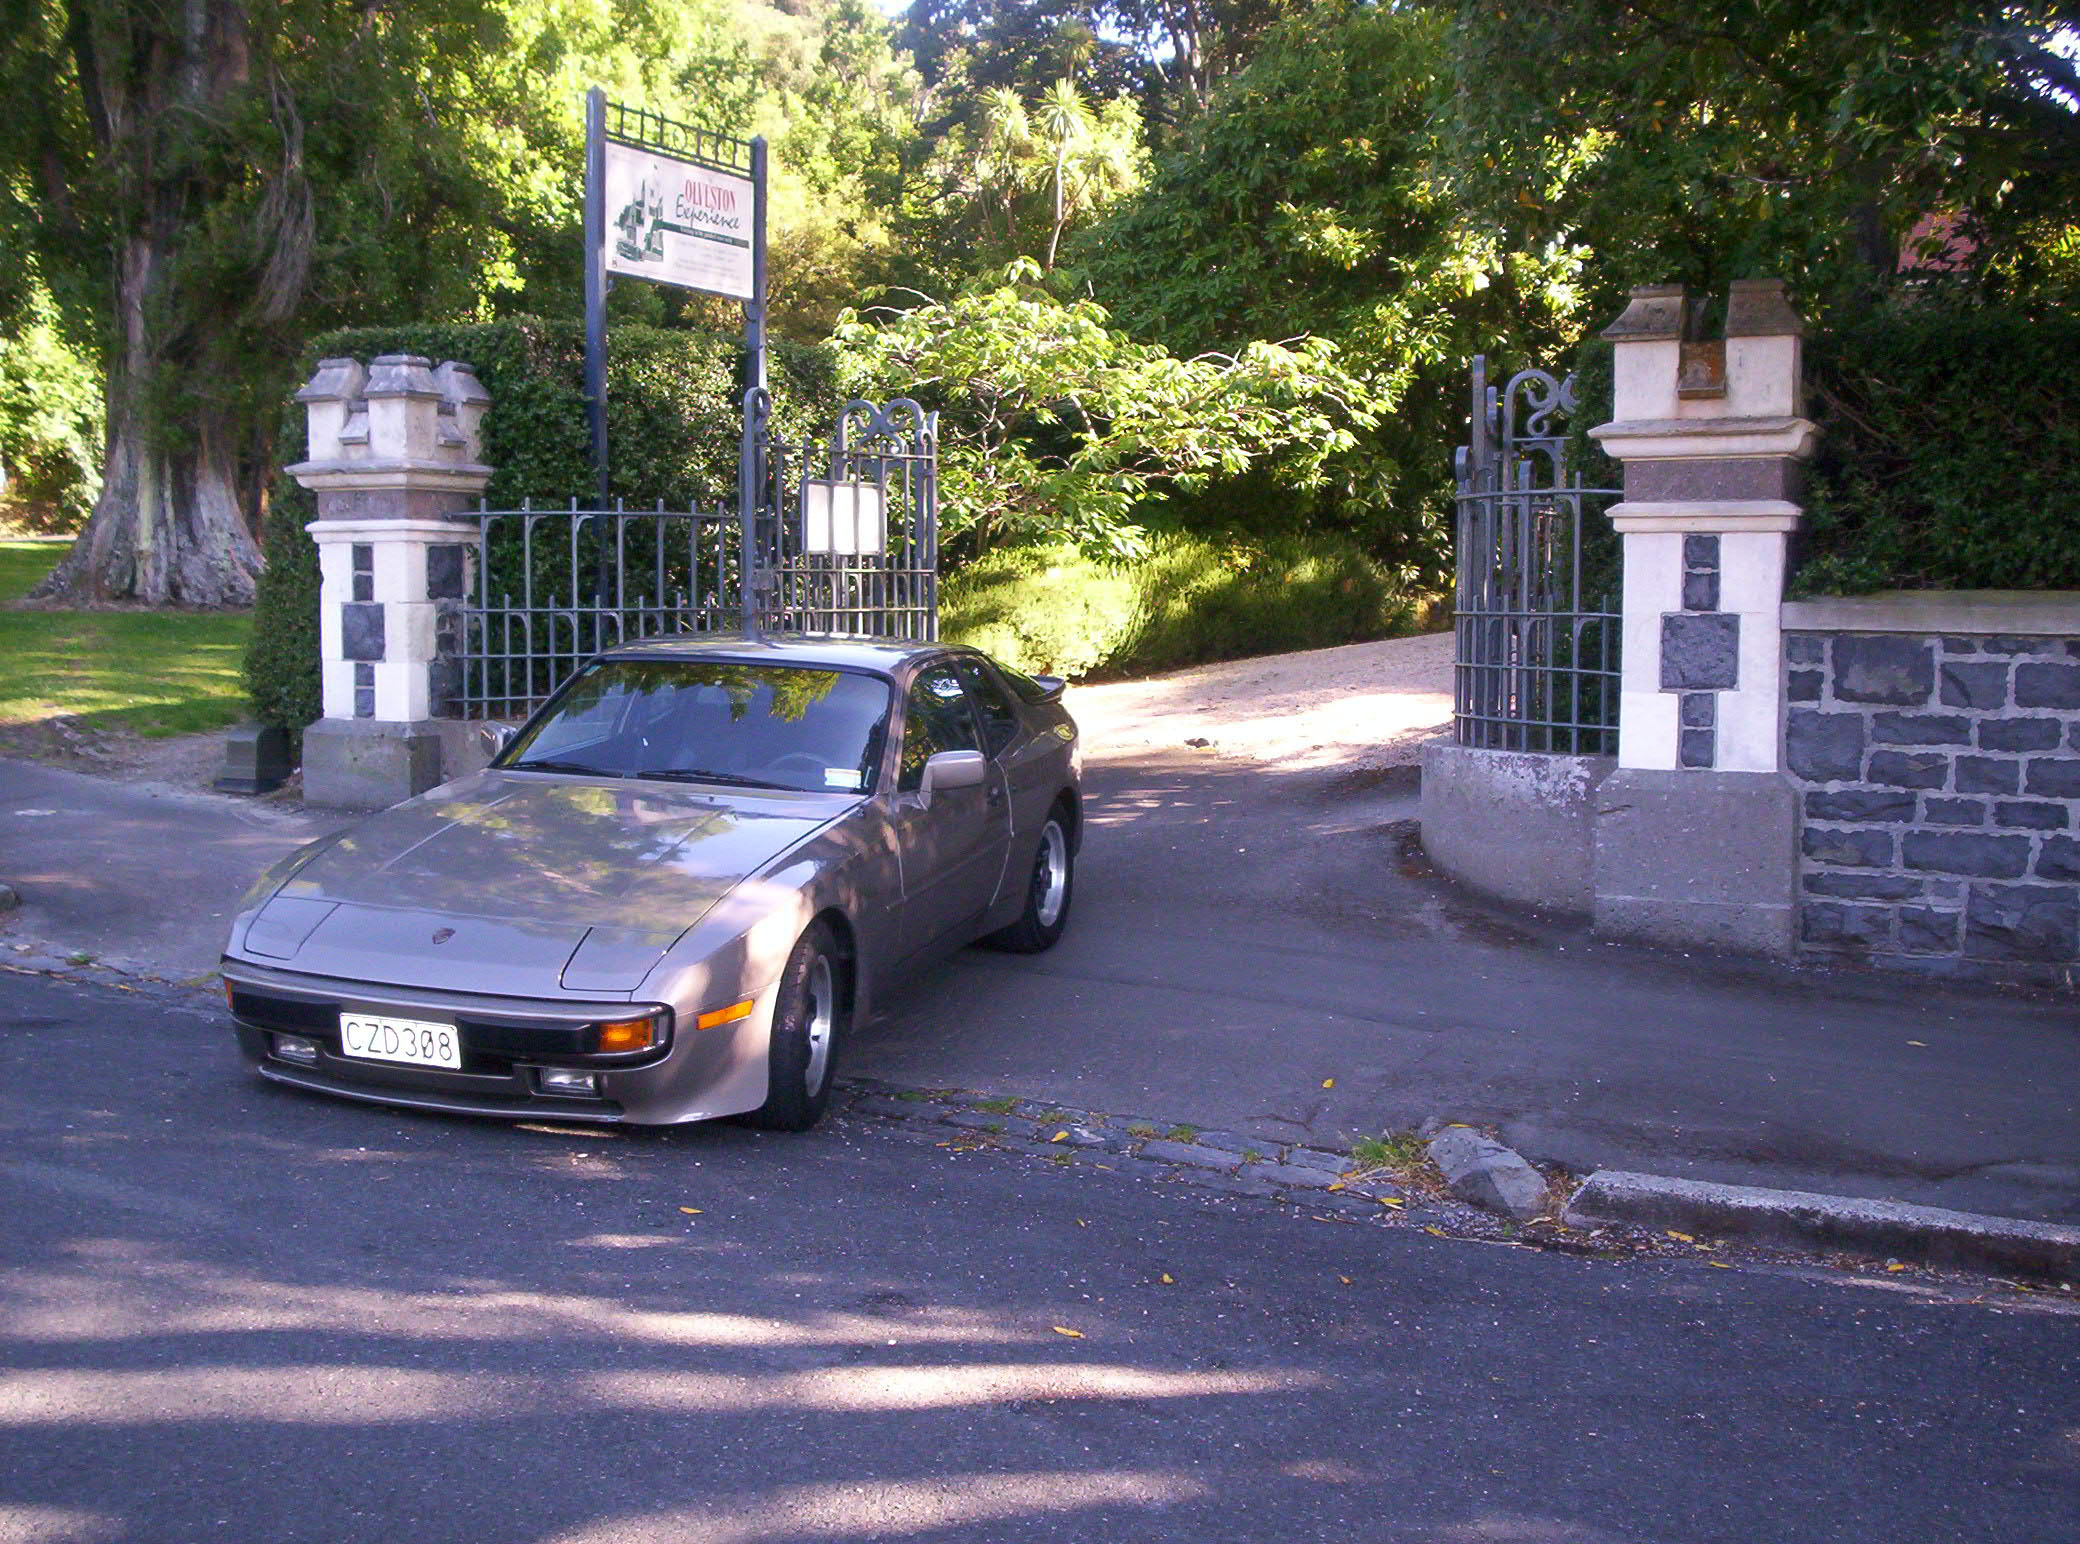 HUES of Granite, Bspo06, Car, Dunedin, Granite, HQ Photo